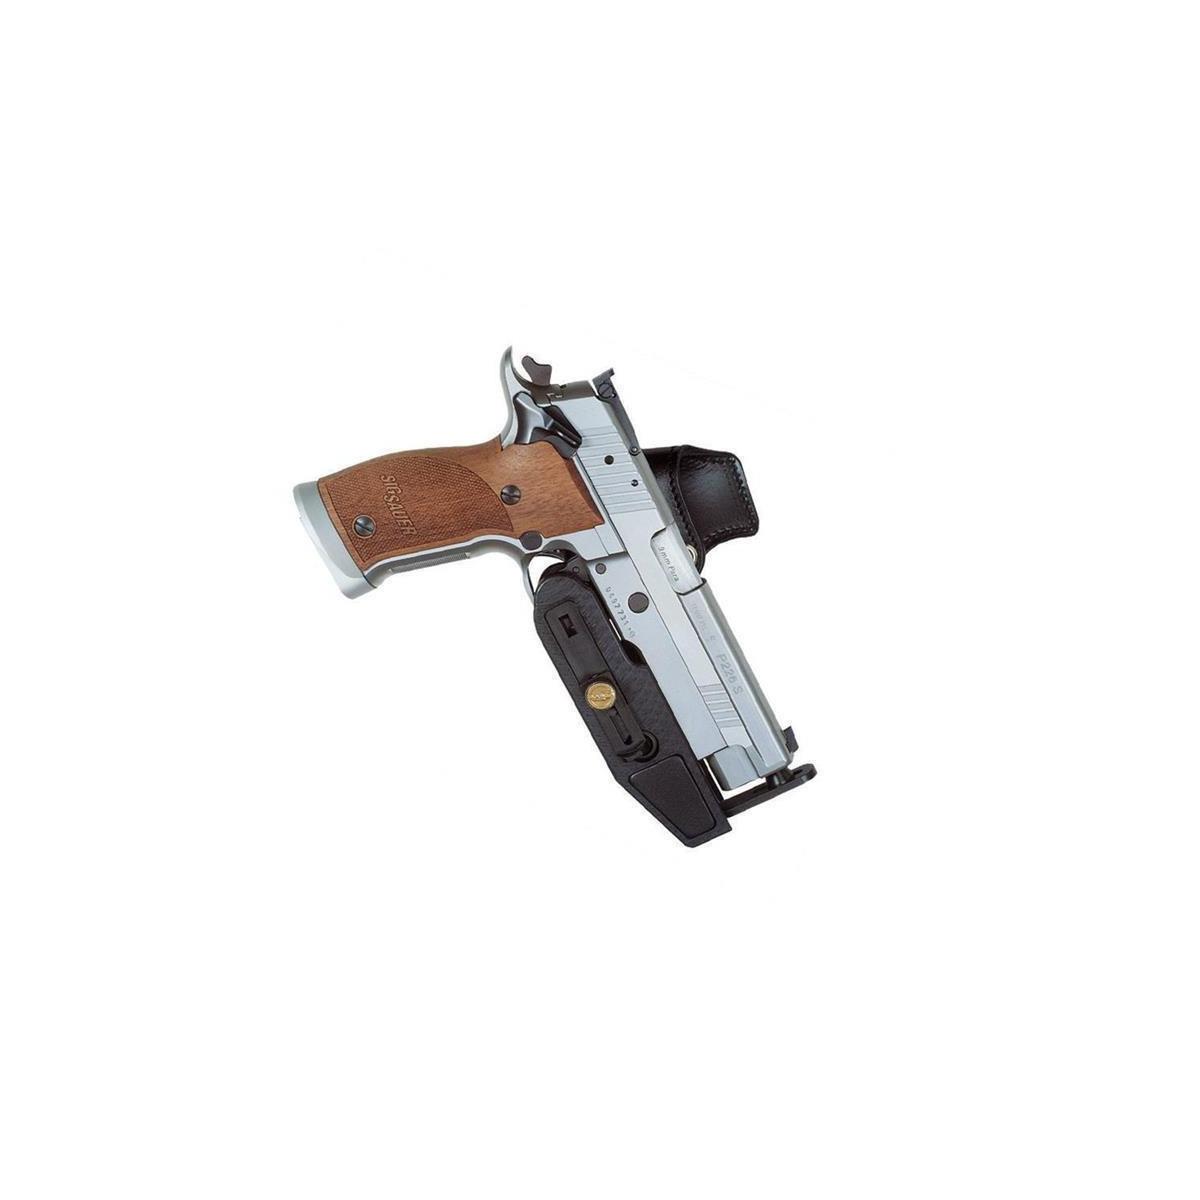 3445040e54c8 Sickinger SPEED MACHINE IPSC belt holster right-Handed-Carbon- Revolver  K-L-N- Frame ...